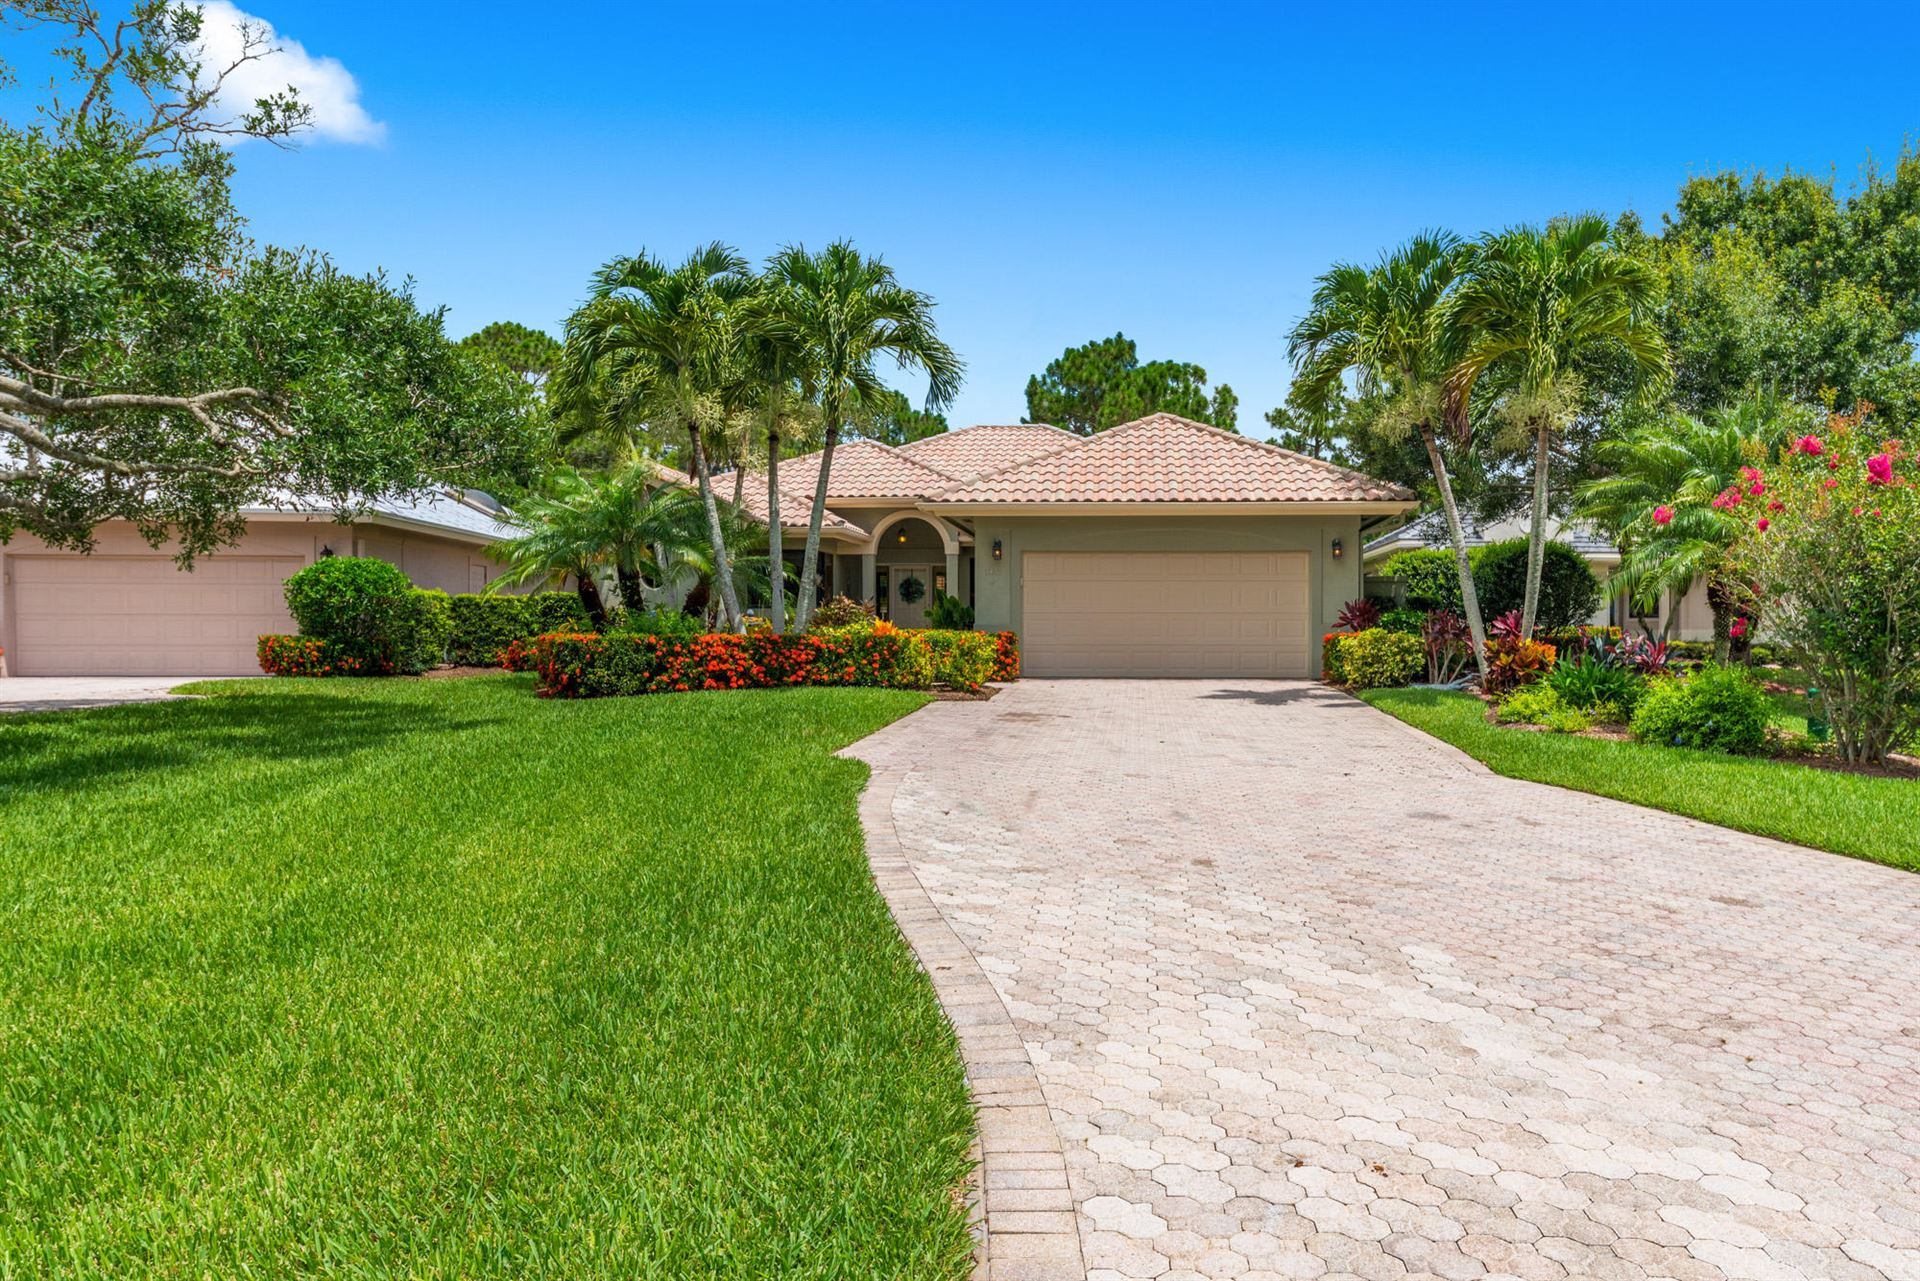 3456 SE Putnam Court, Stuart, FL 34997 - #: RX-10608516